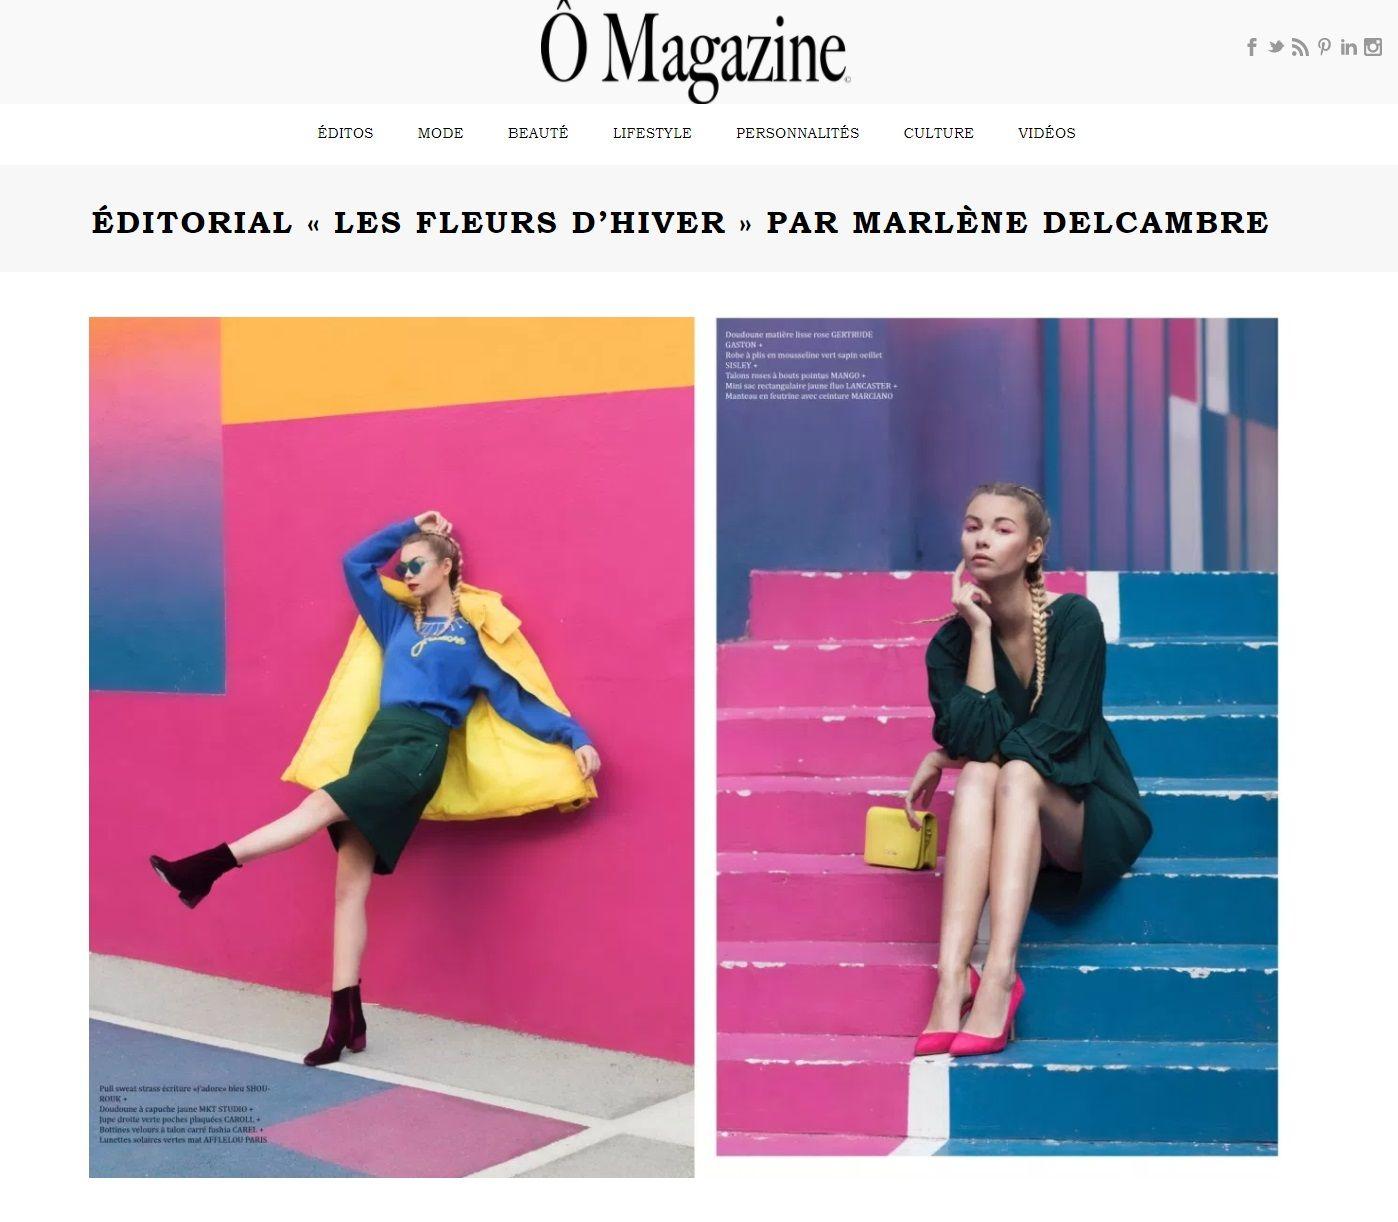 Couverture presse : Omagazine.fr